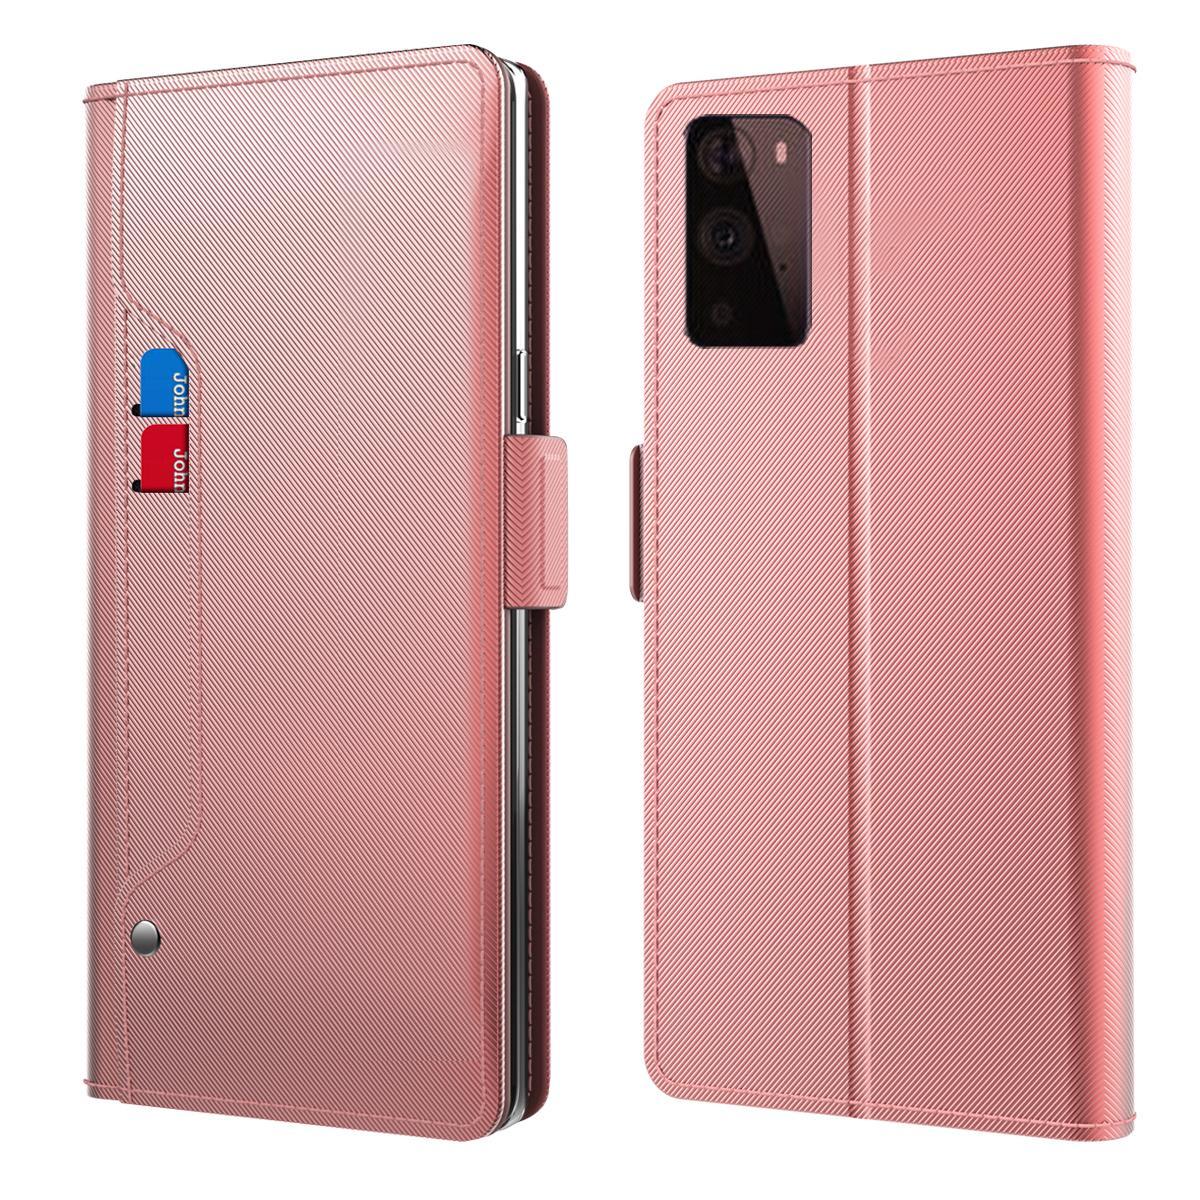 Plånboksfodral Spegel OnePlus 9 Rosa Guld